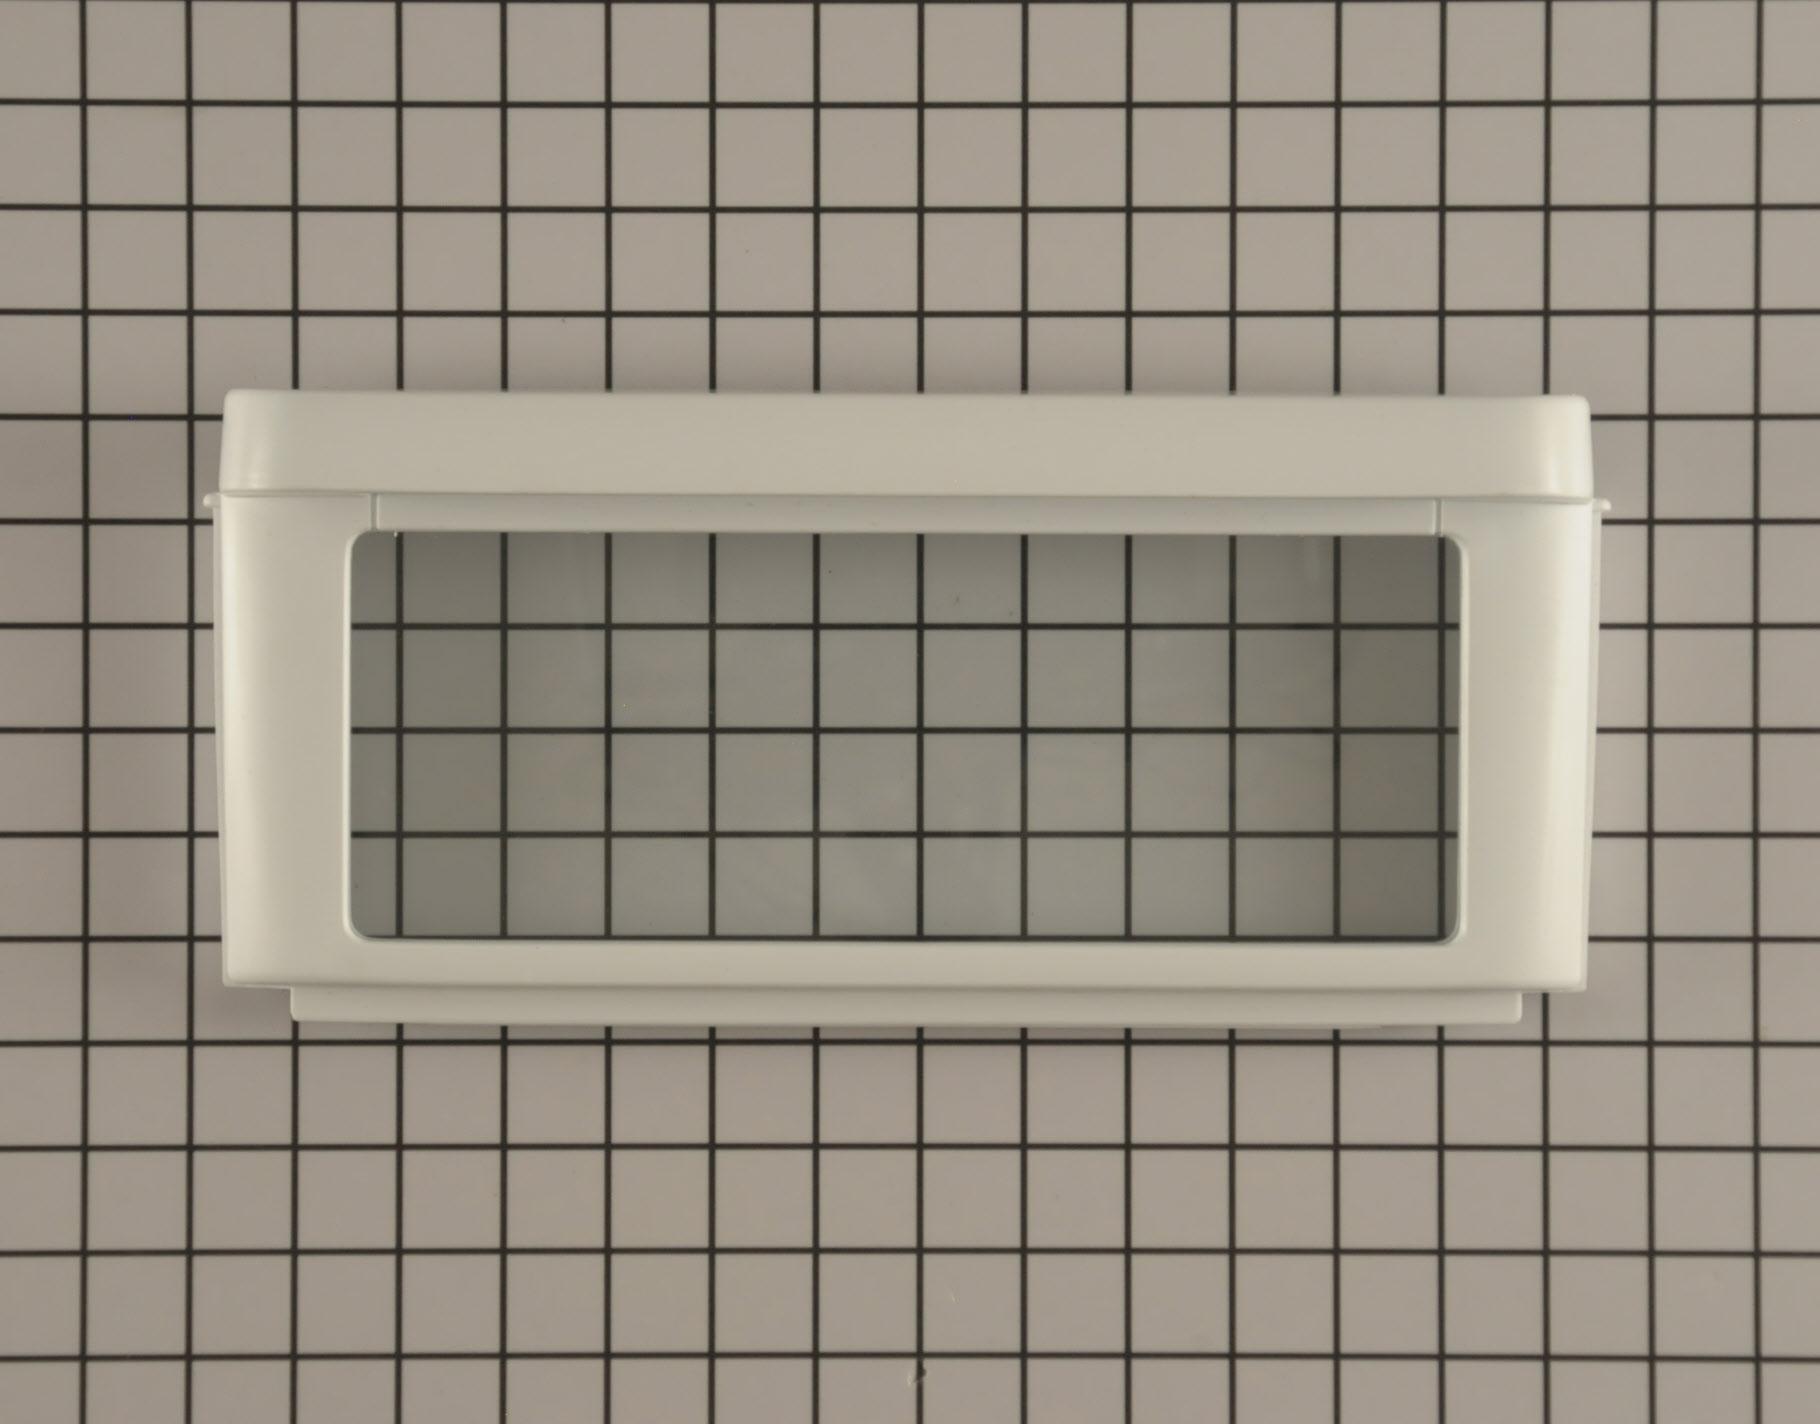 218278703 Kenmore Refrigerator Part -Drawer Front